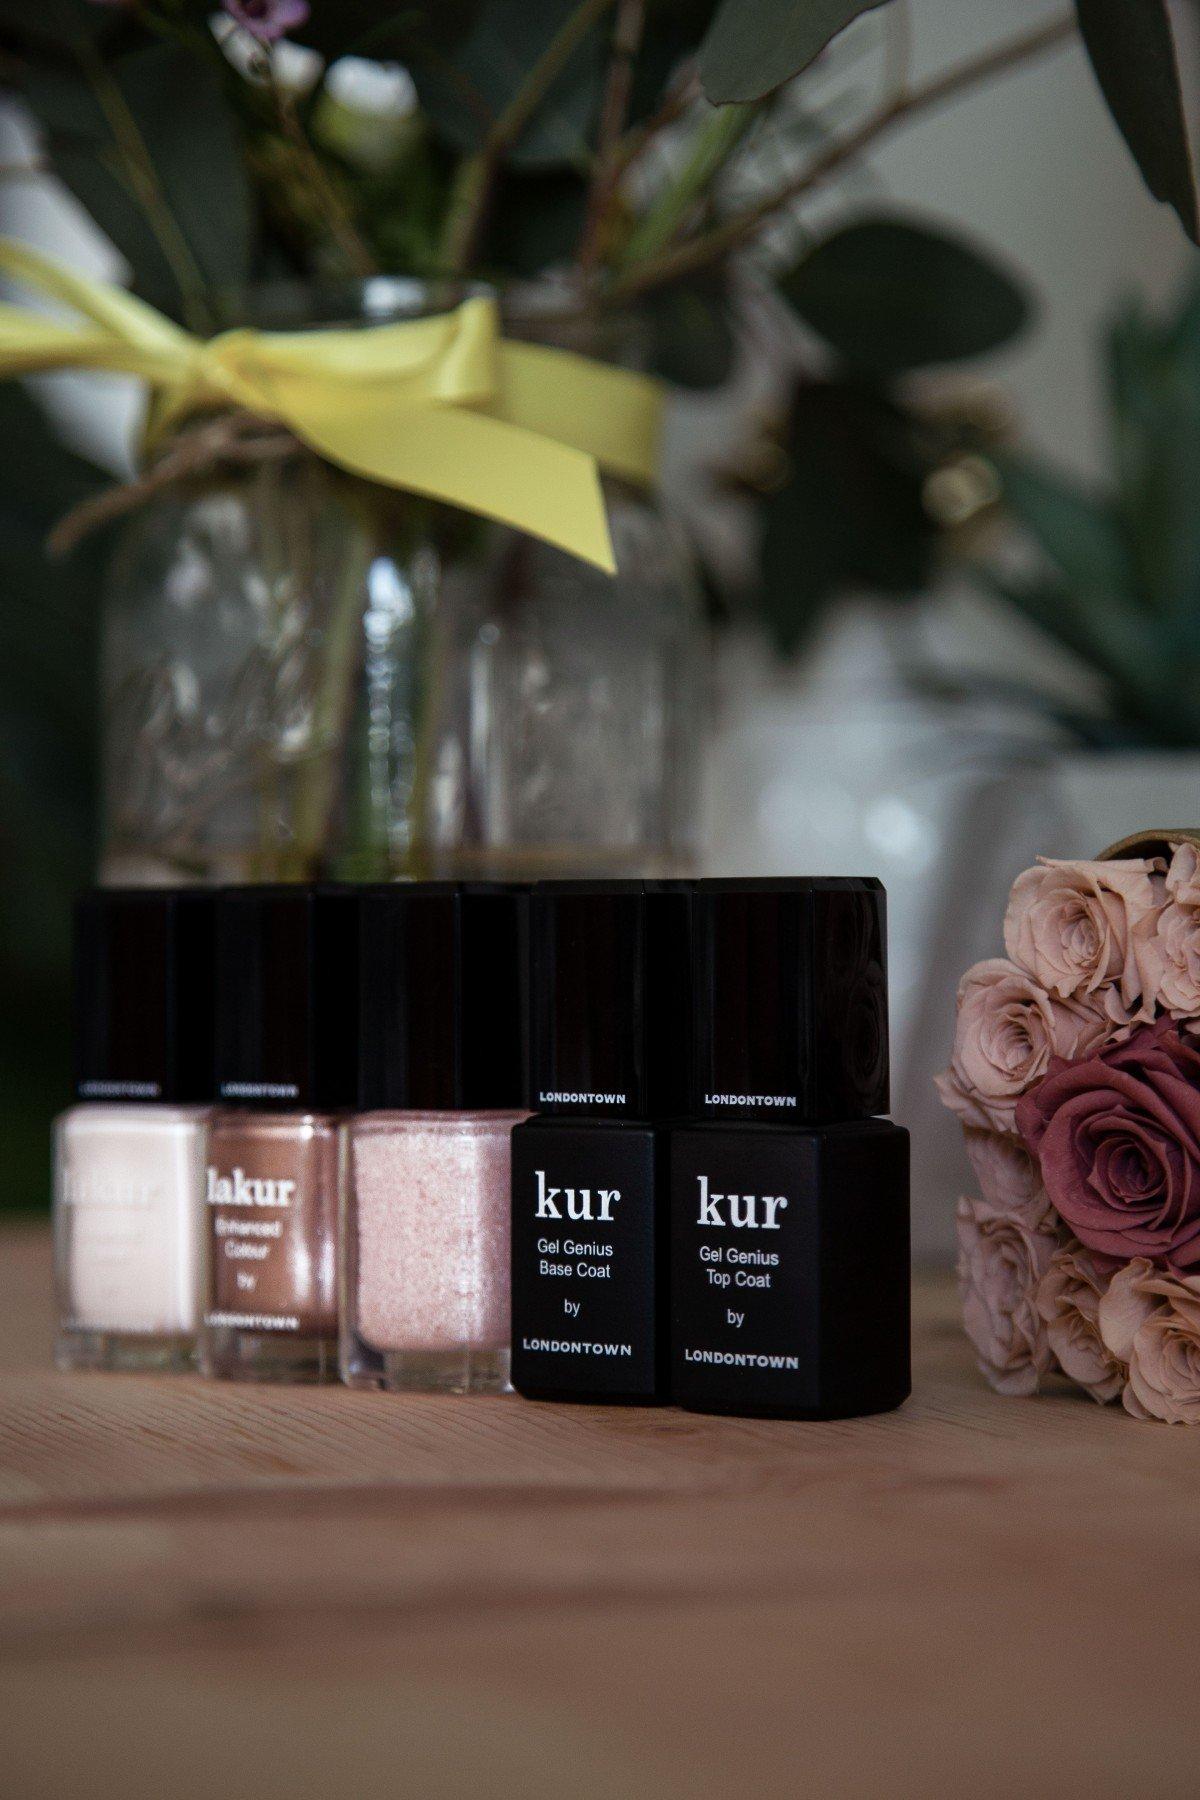 londontown nail polish review